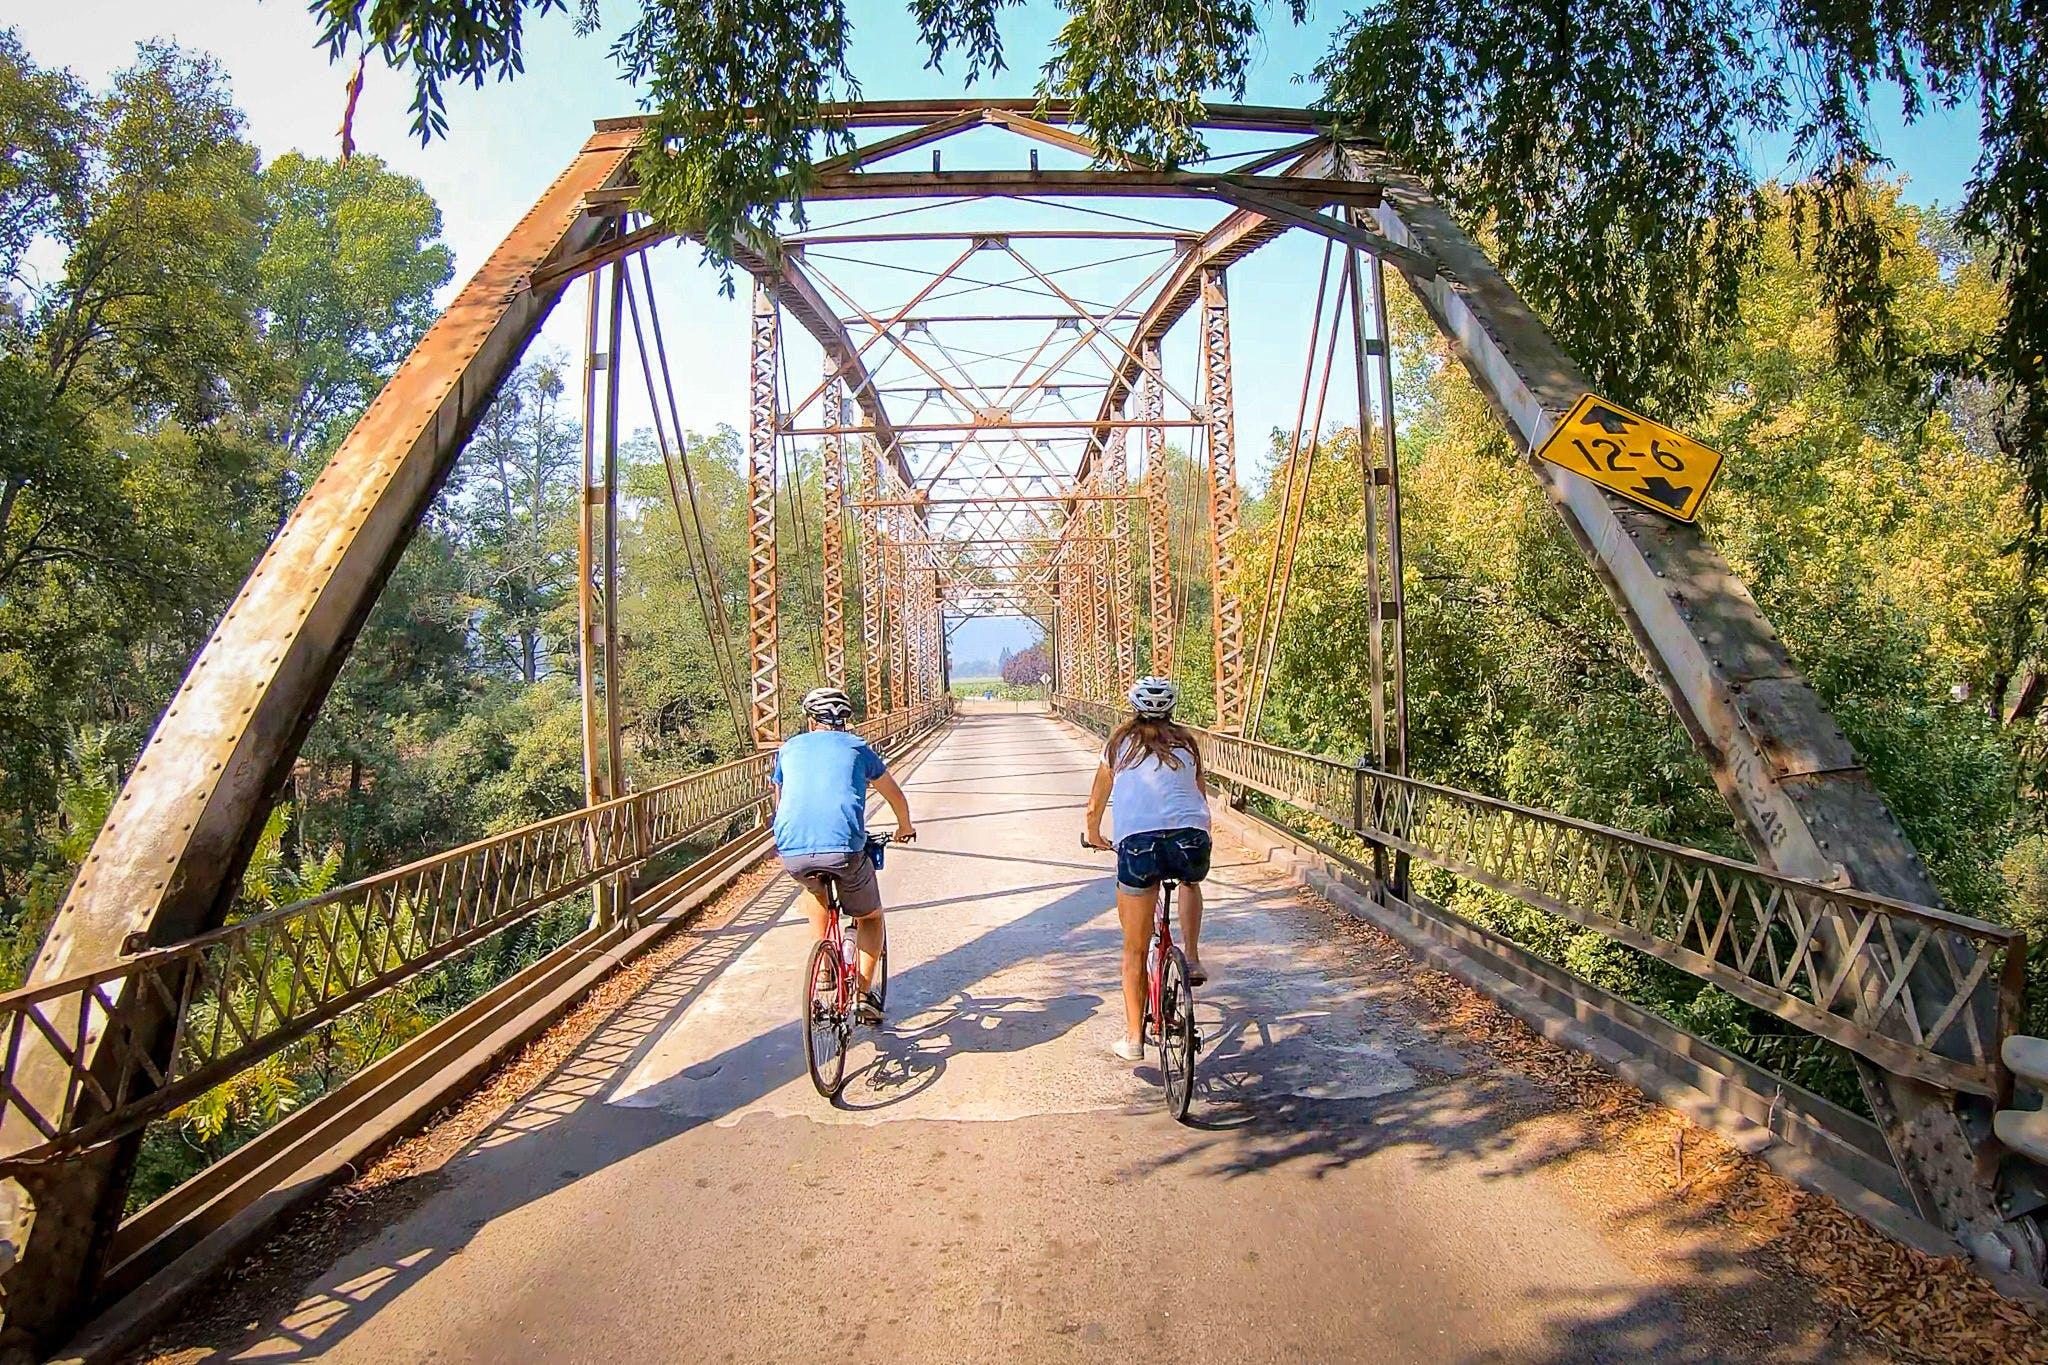 Rent a bike or E-bike at Getaway Adventures and wine taste along Dry Creek Valley in Healdsburg